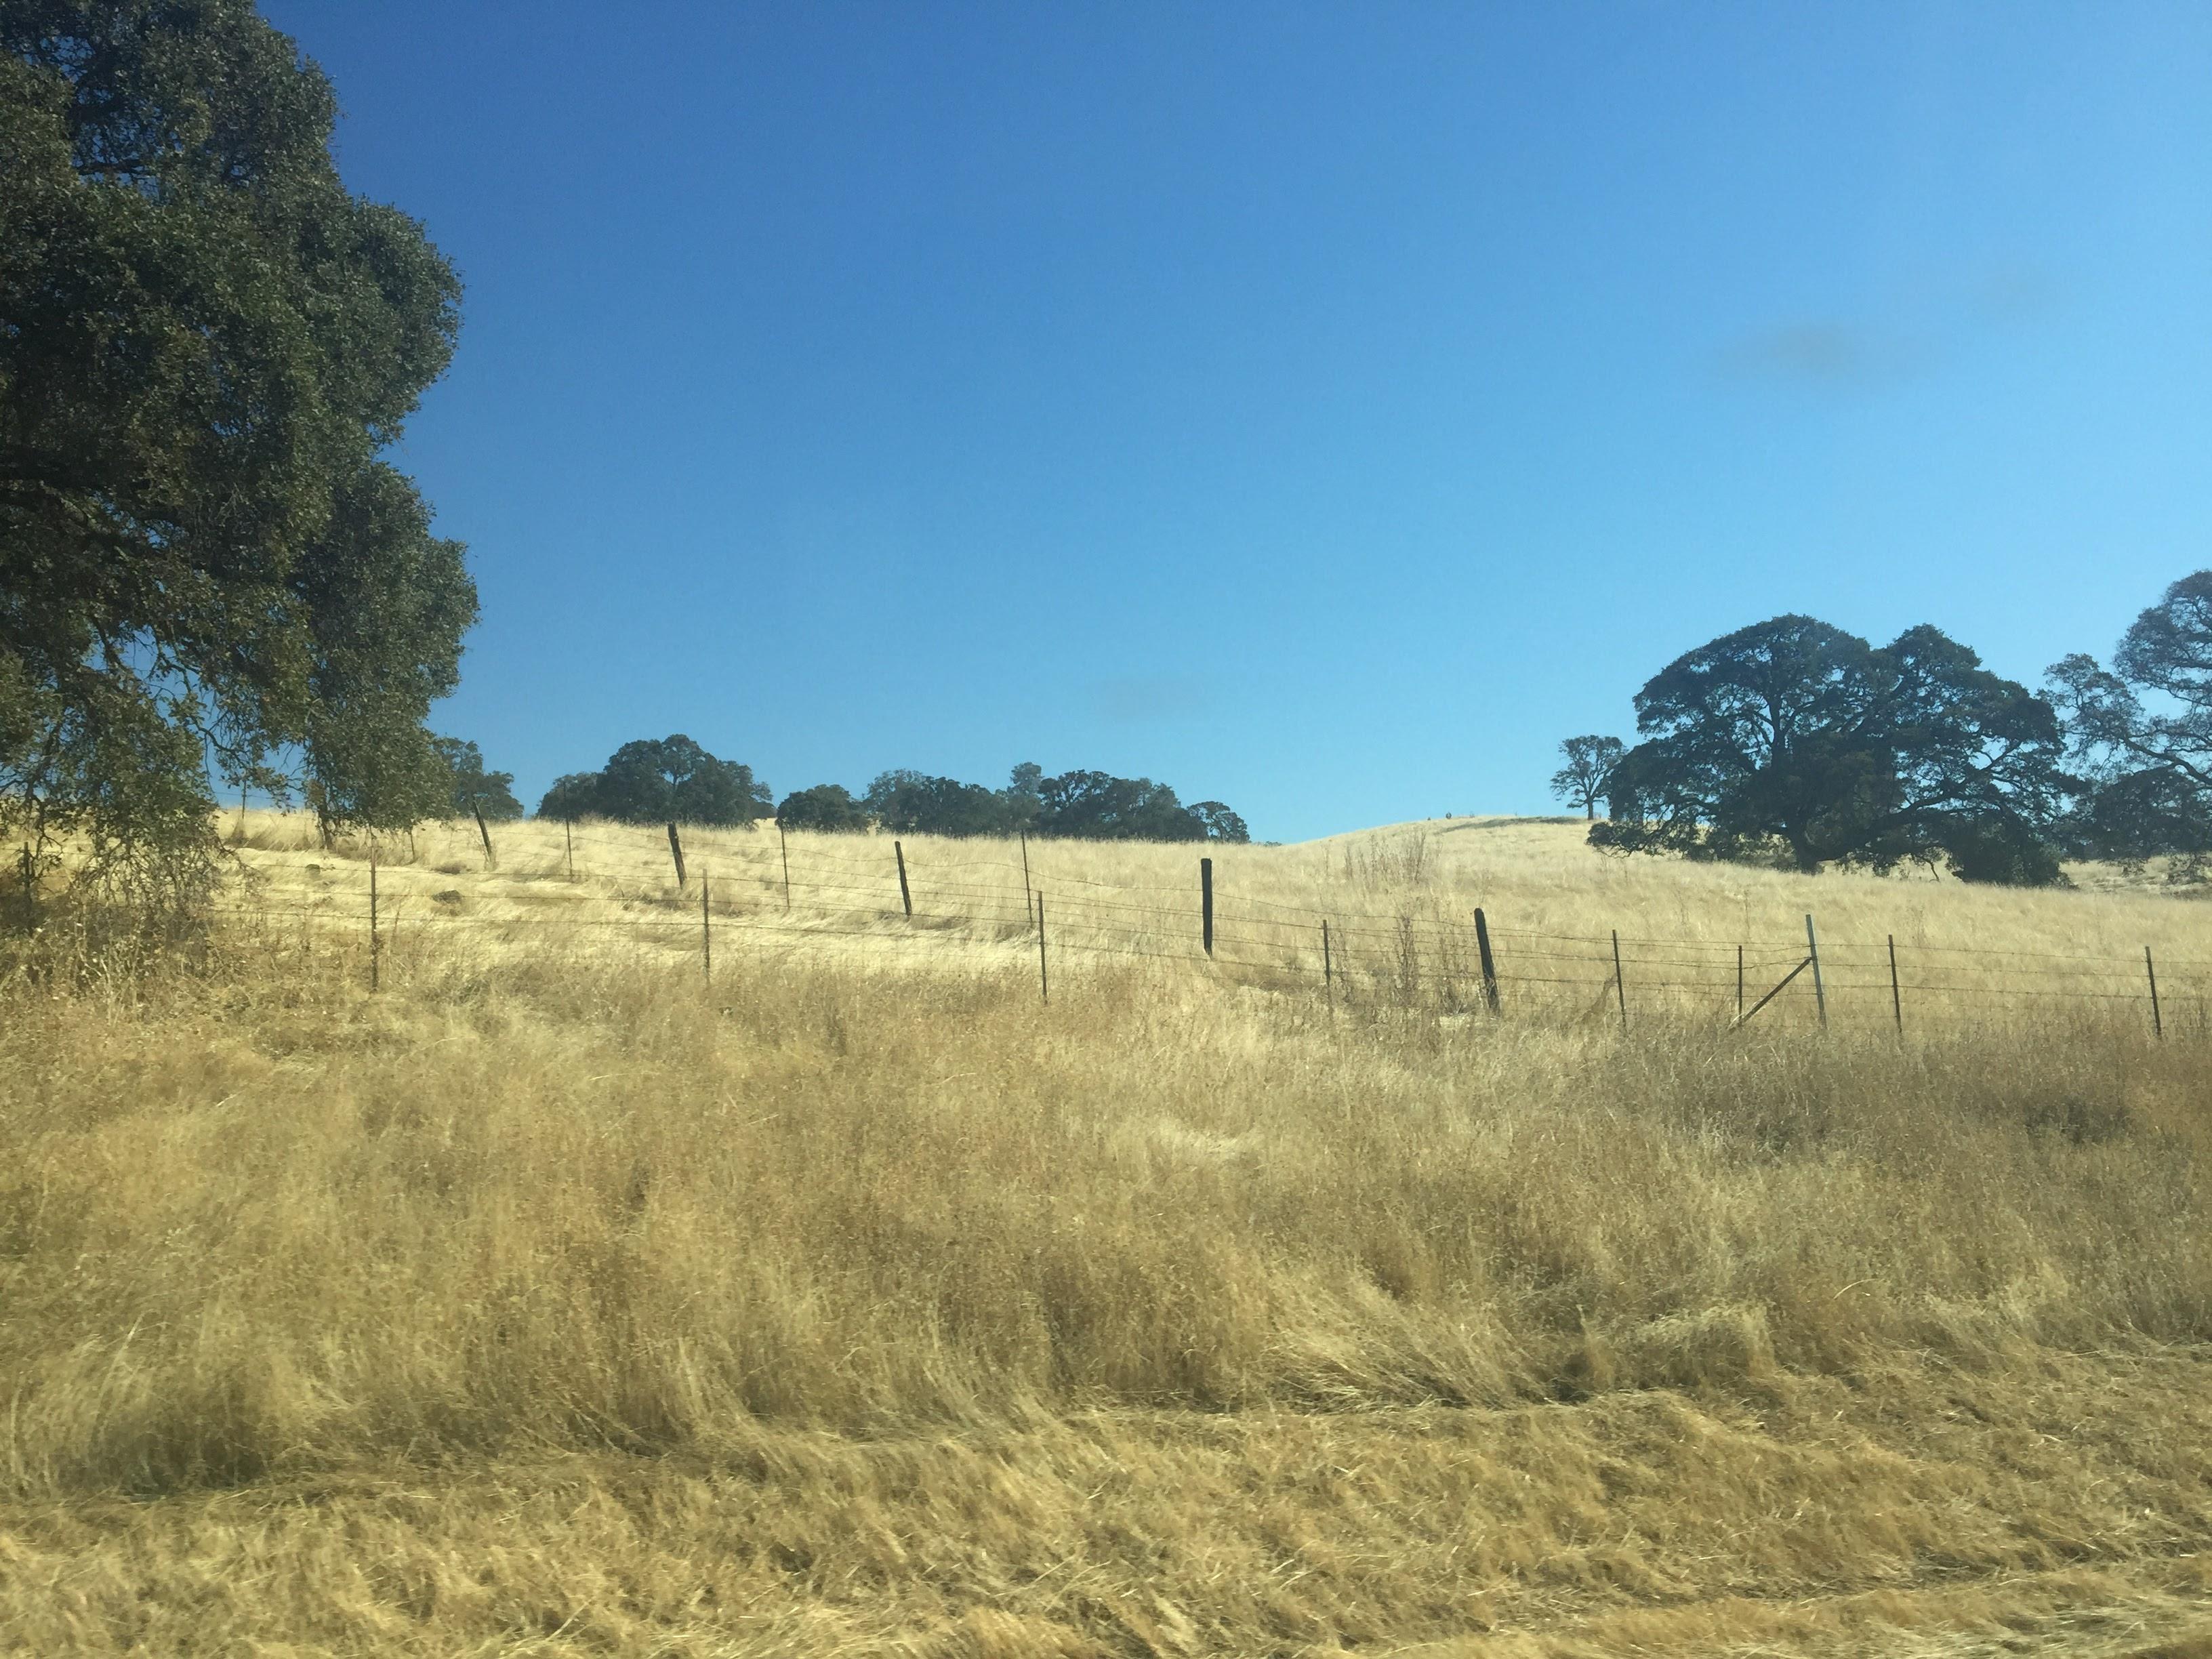 2017-10-14 California 01 Views 01